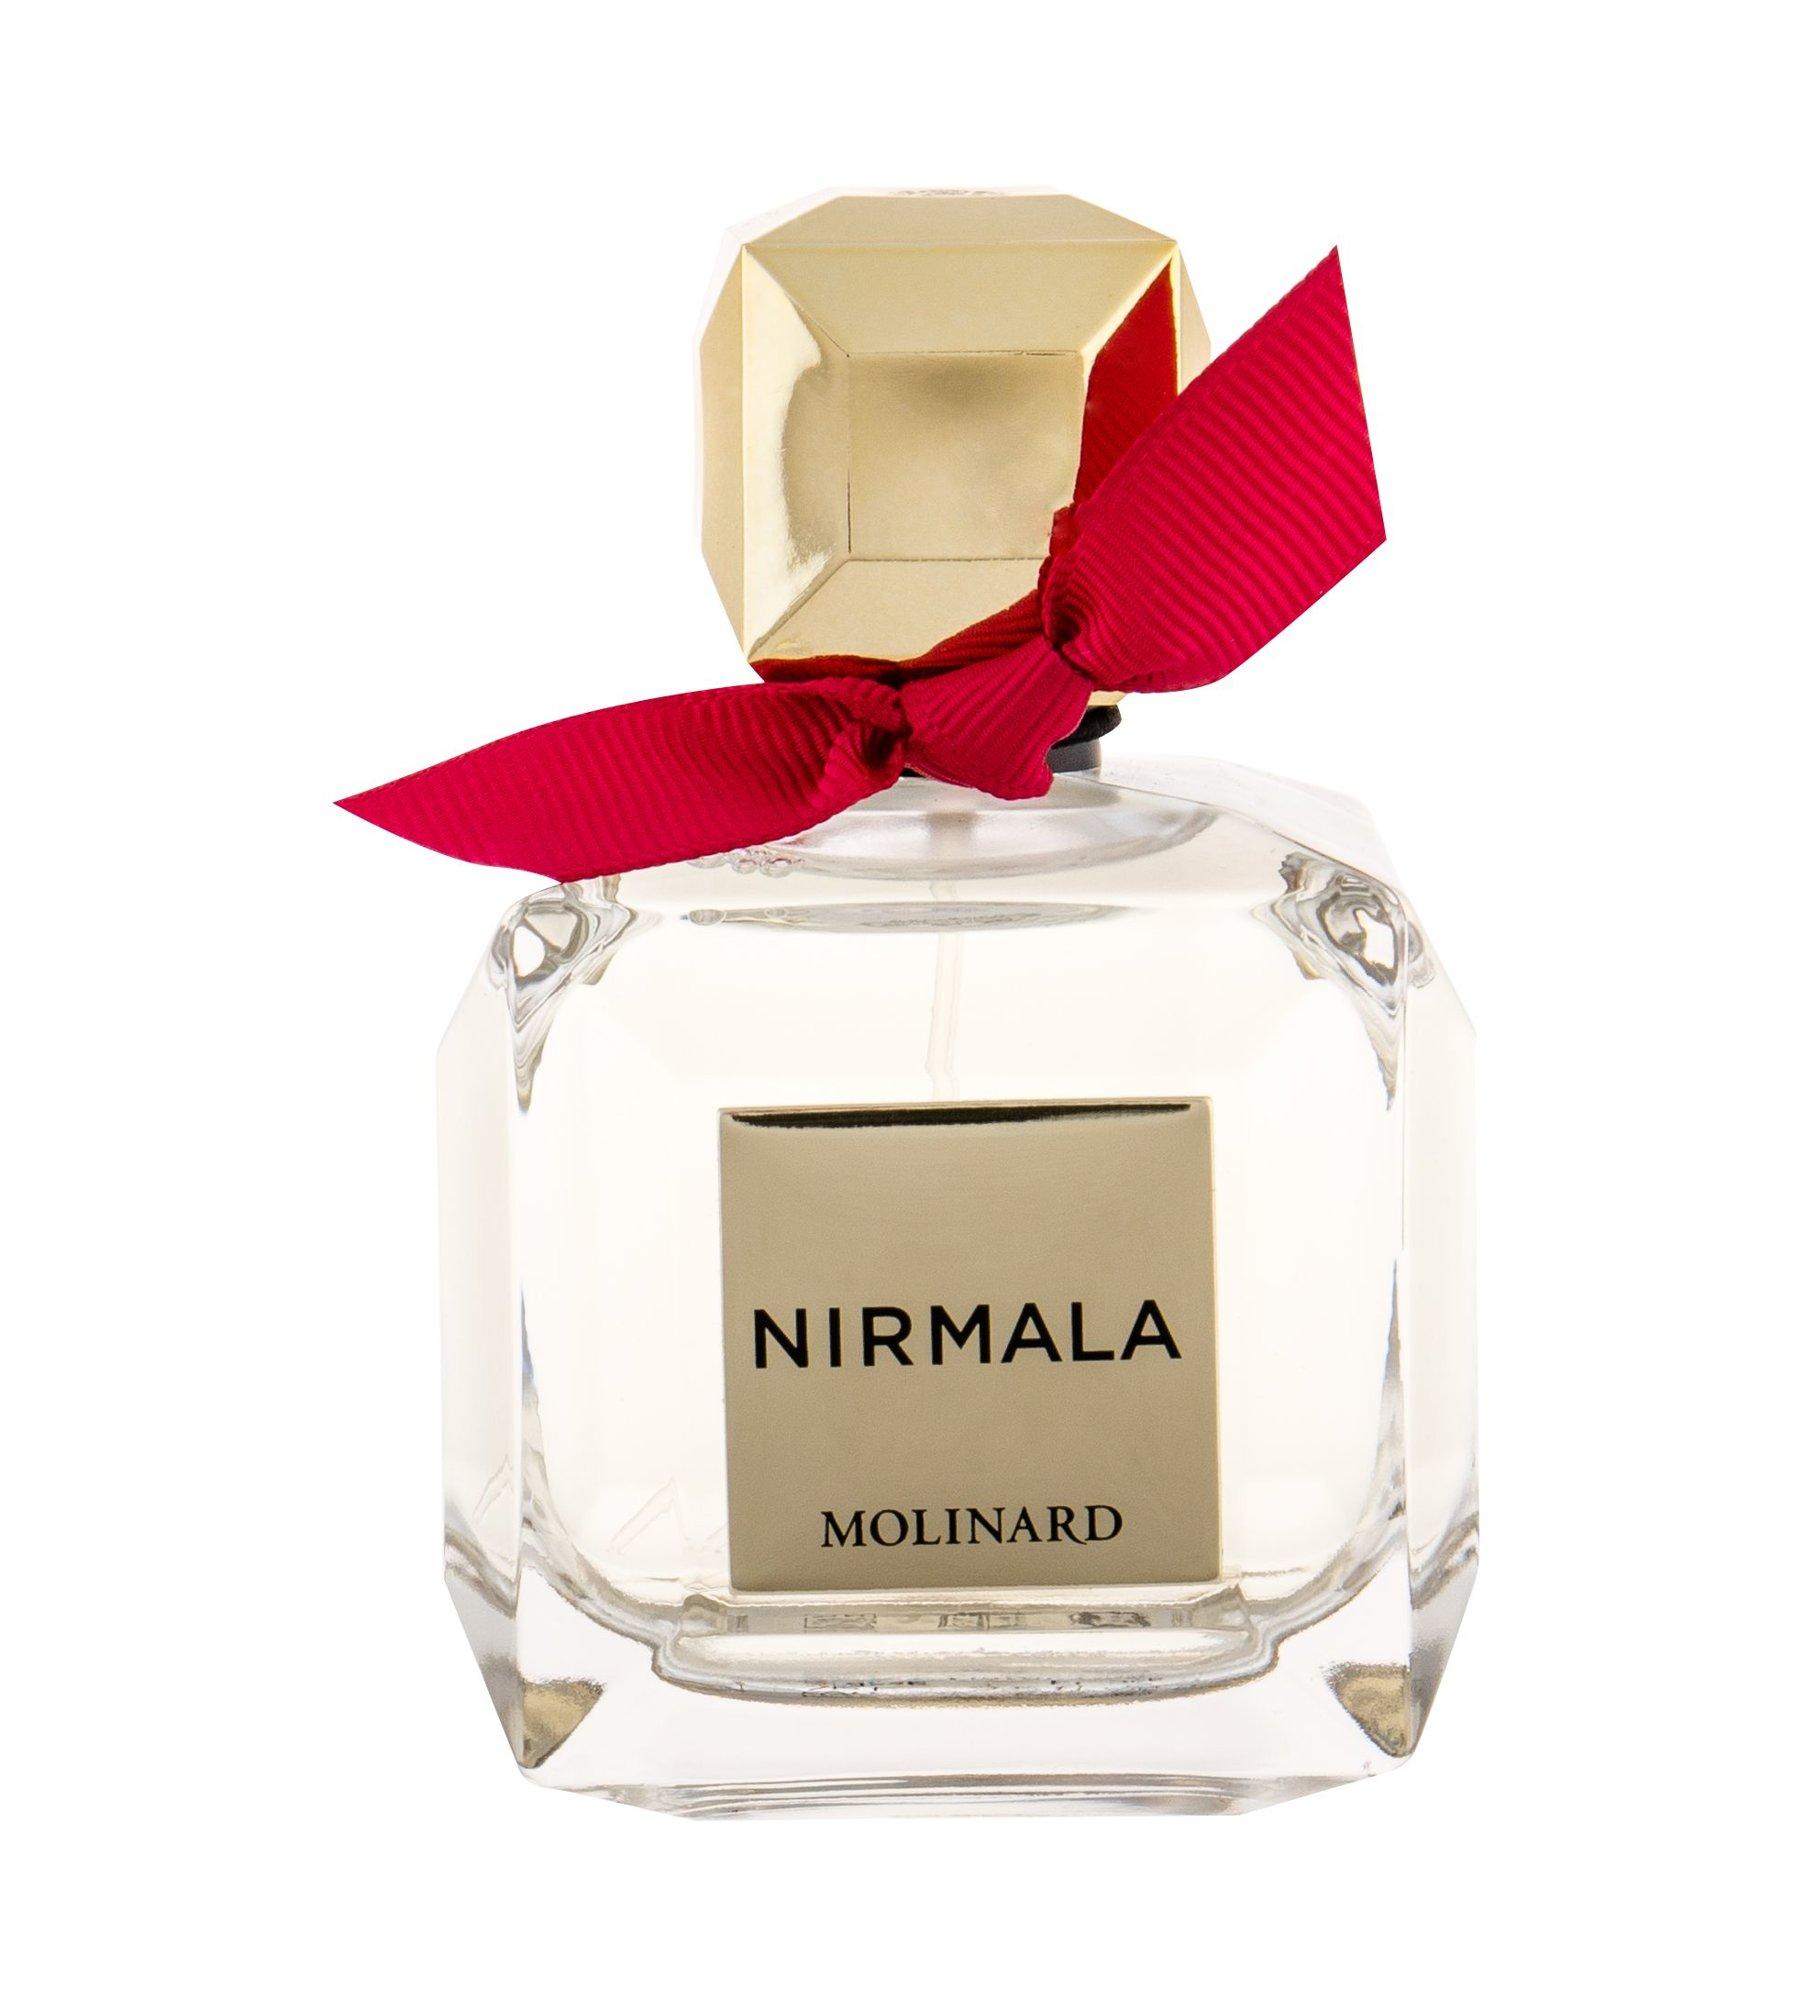 Molinard Nirmala Eau de Parfum 100ml